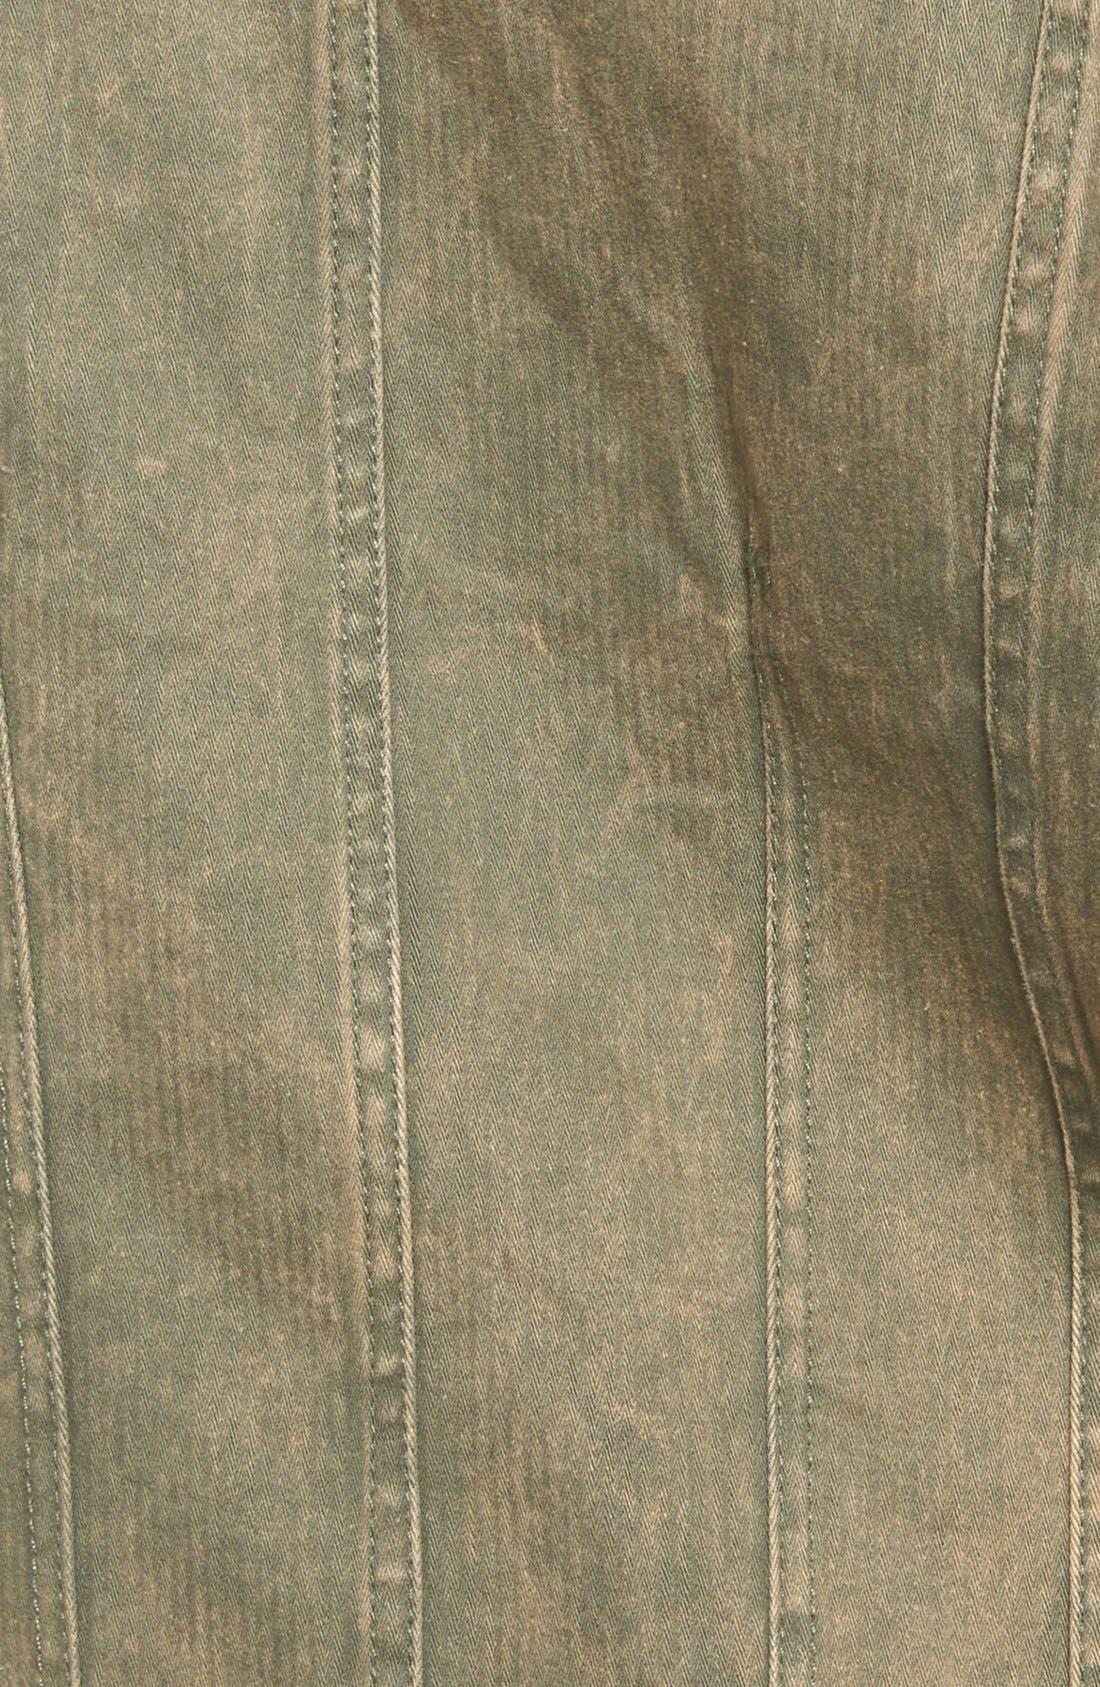 Contrast Sleeve Twill Jacket,                             Alternate thumbnail 2, color,                             300